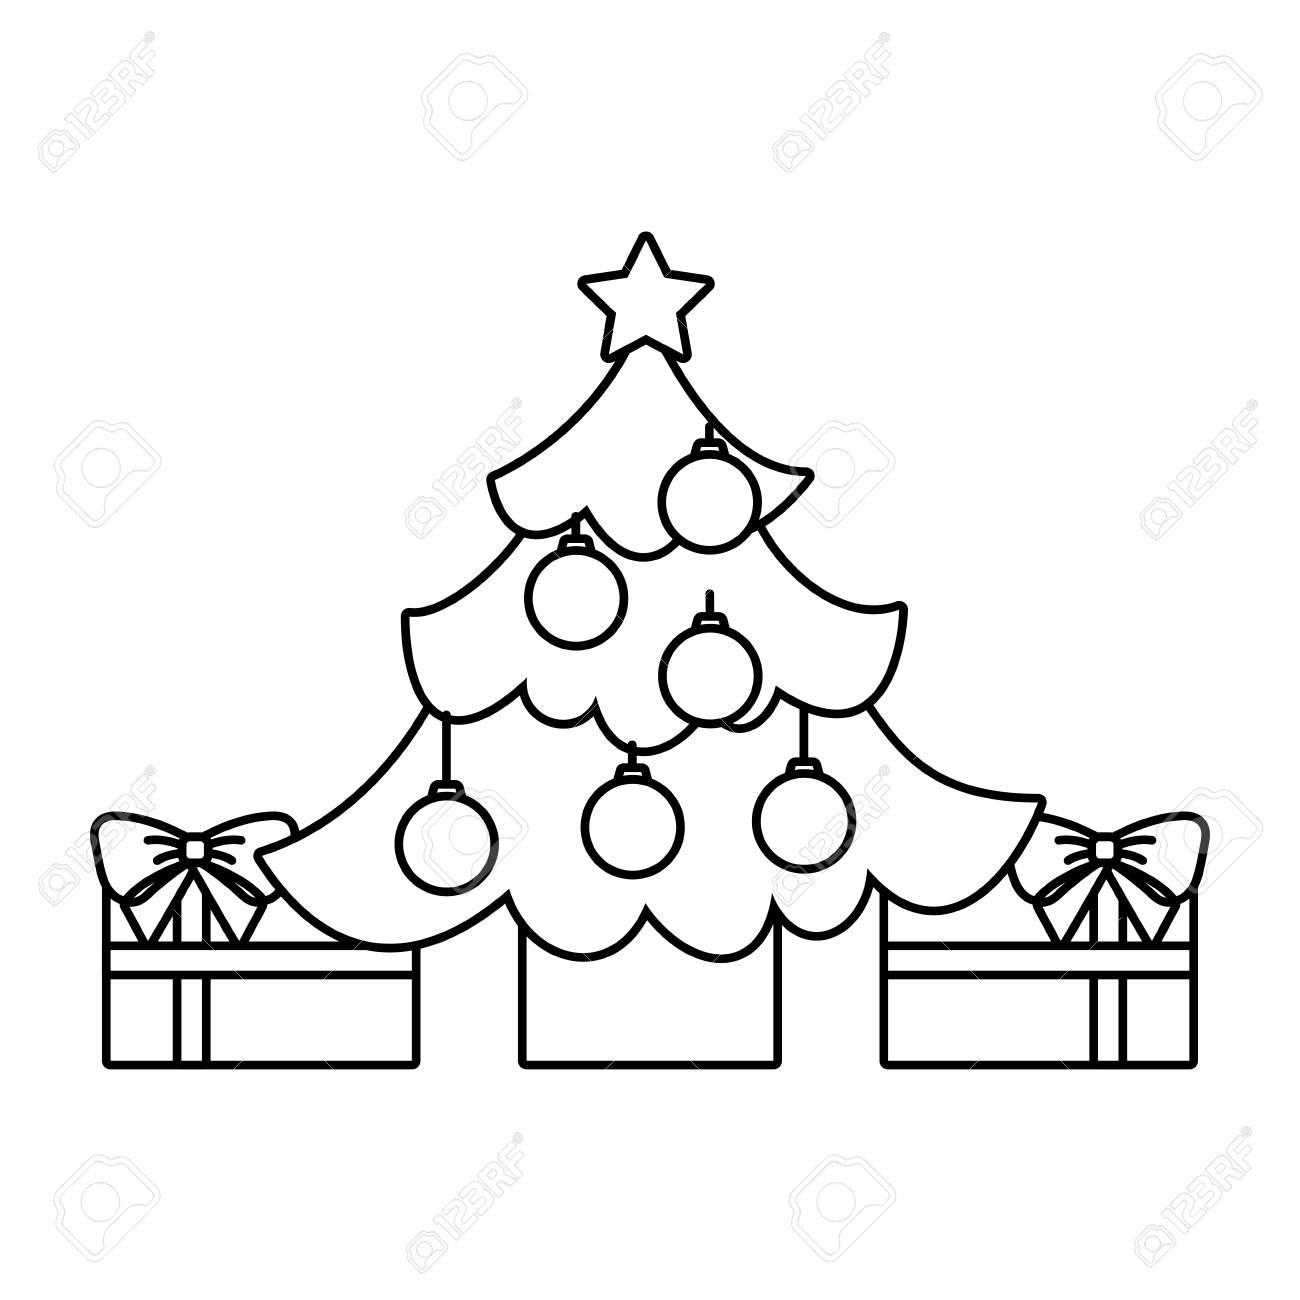 Christmas Tree No Color Design. Royalty Free Cliparts, Vectors, And ...